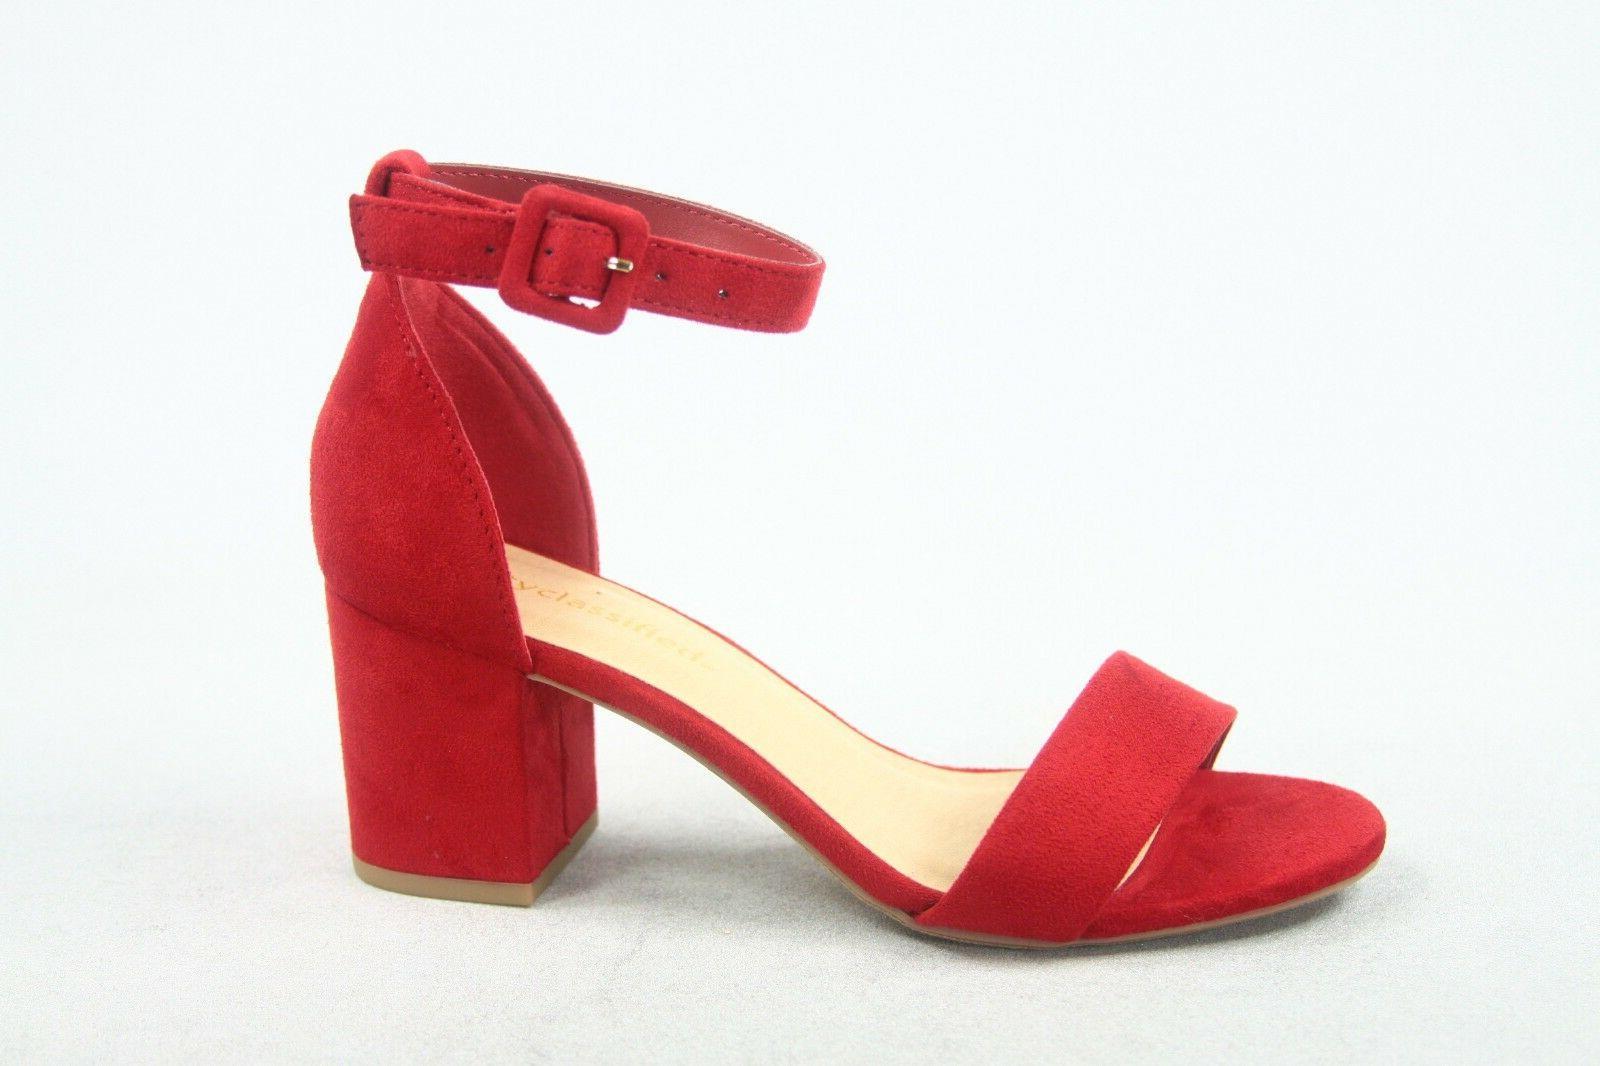 Strap Chunky Dress Sandal Shoes 5